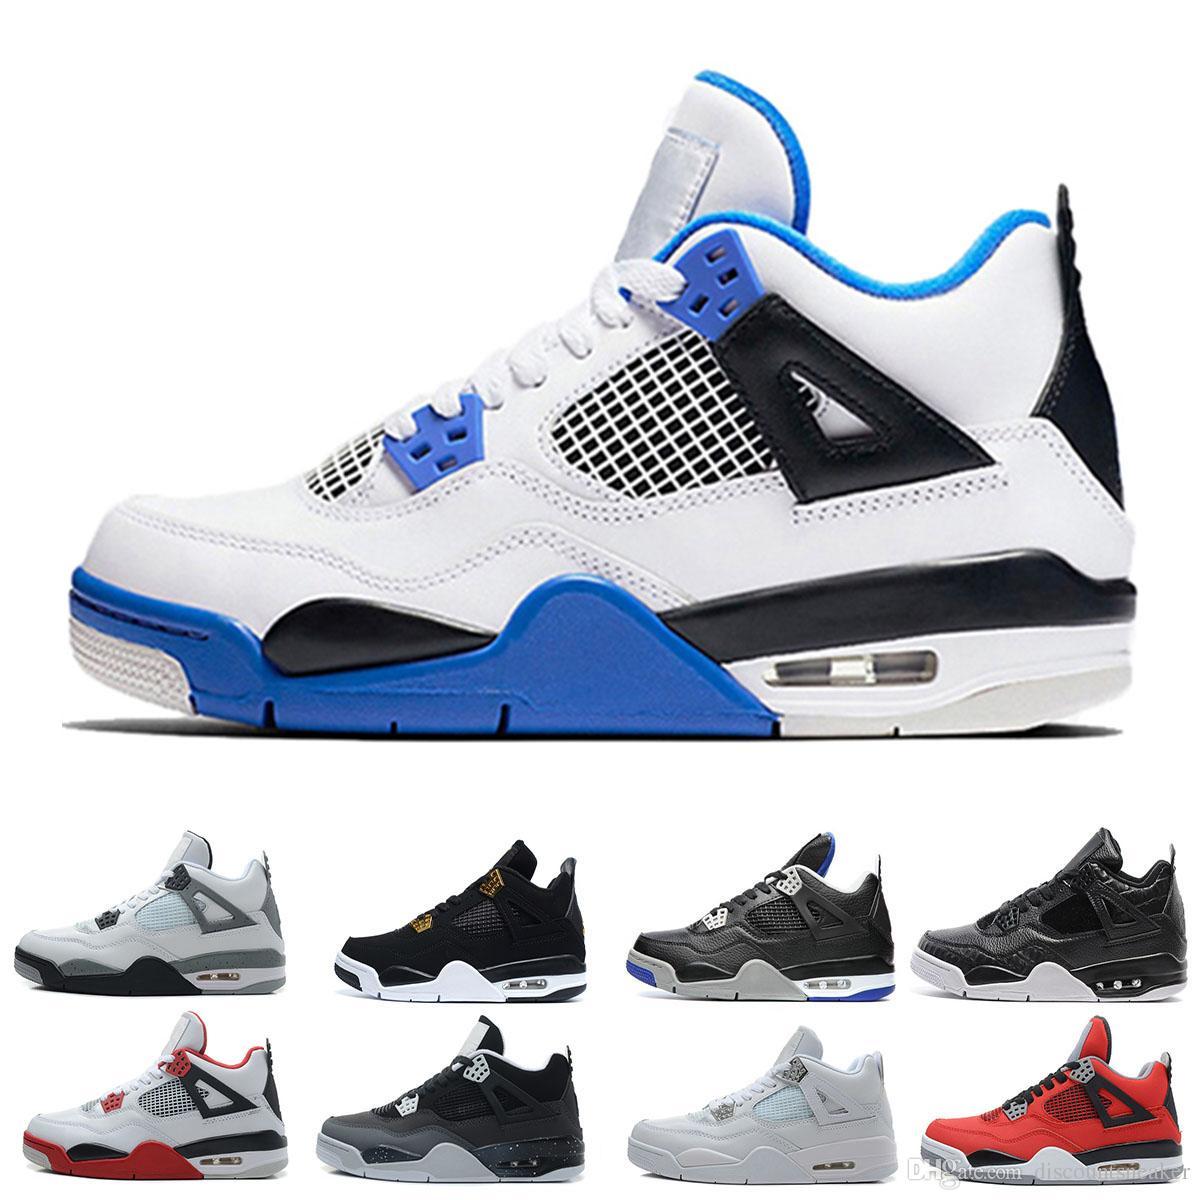 82e549f7f645 High Quality 4 Man Basketball Shoes 4s Pure Money Premium Black Cat ...